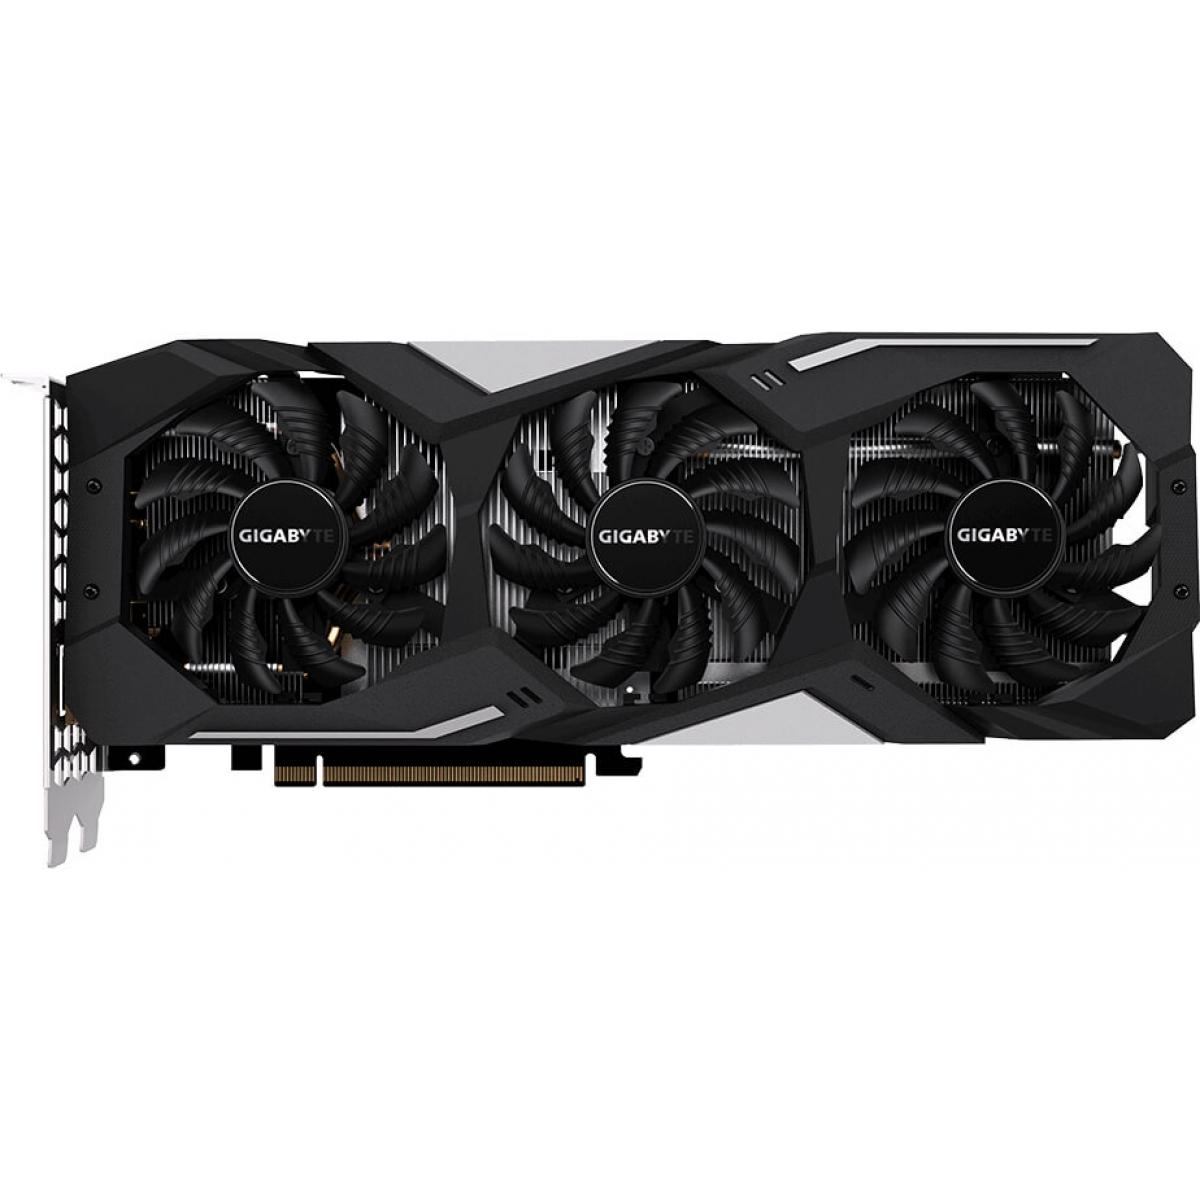 Placa de Vídeo Gigabyte Geforce RTX 2060 Gaming OC, 6GB GDDR6, 192Bit